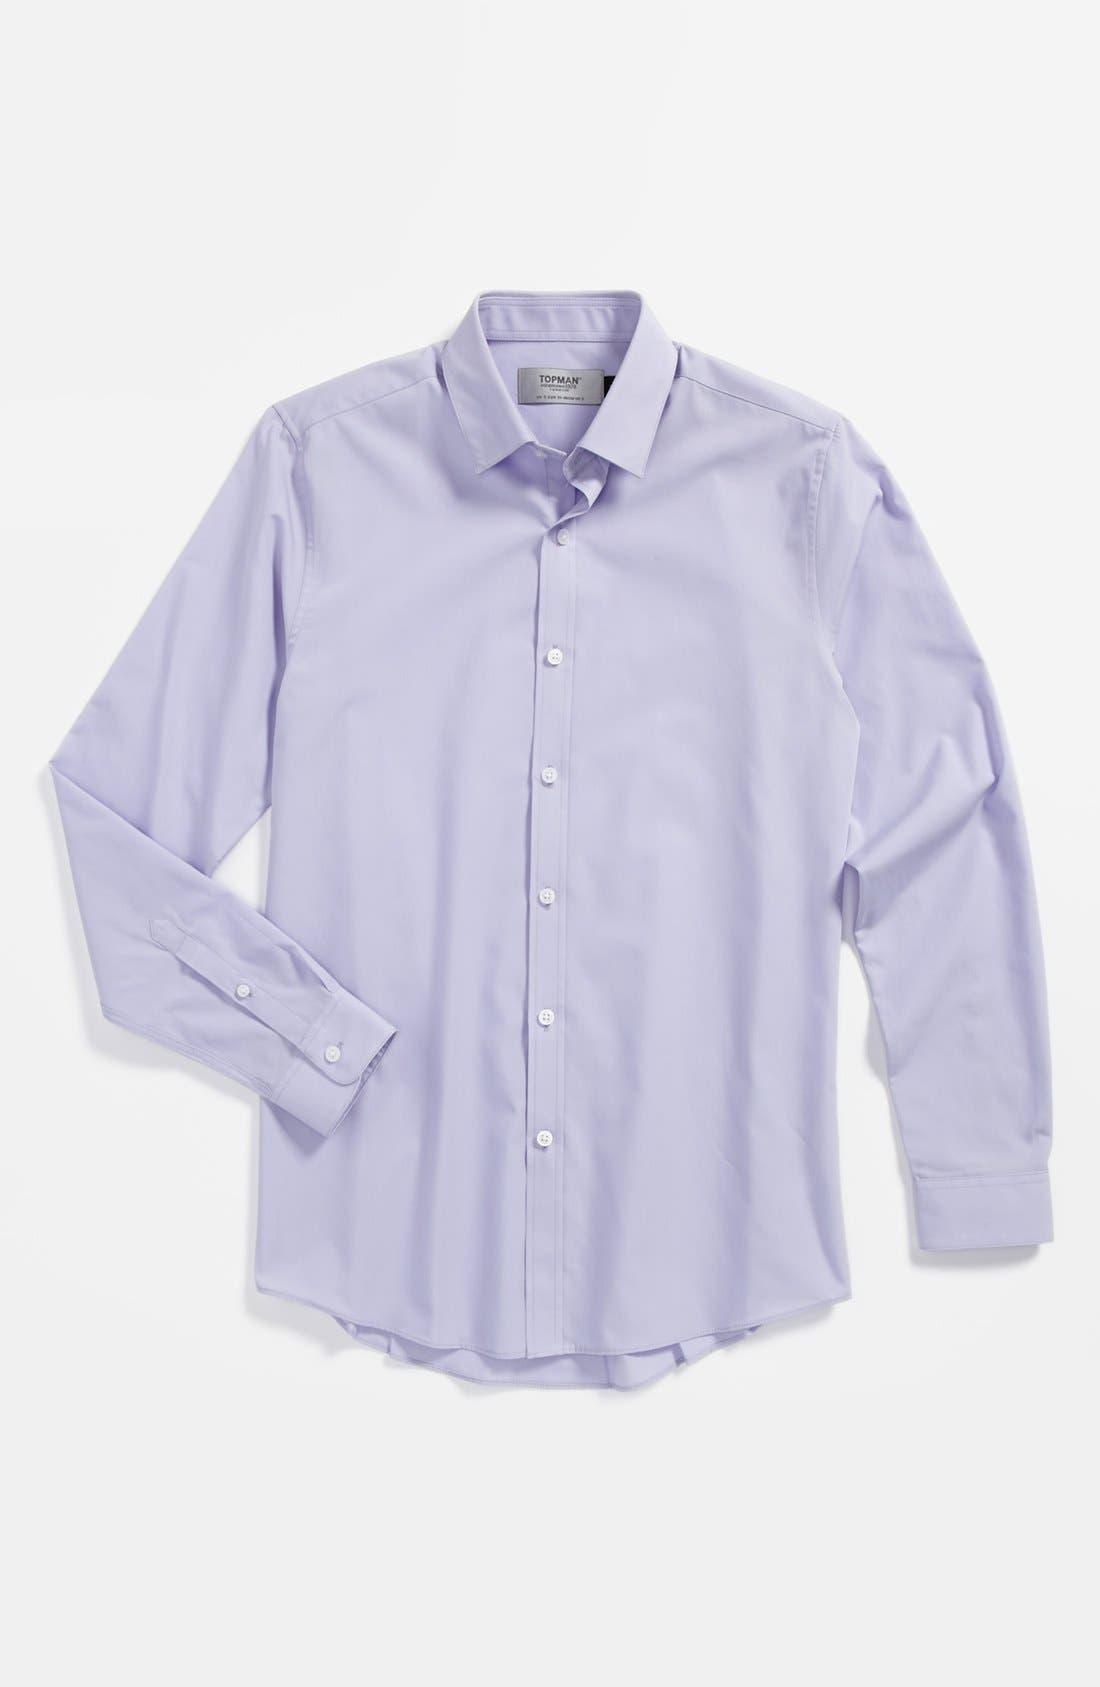 Main Image - Topman 'Smart' Dress Shirt